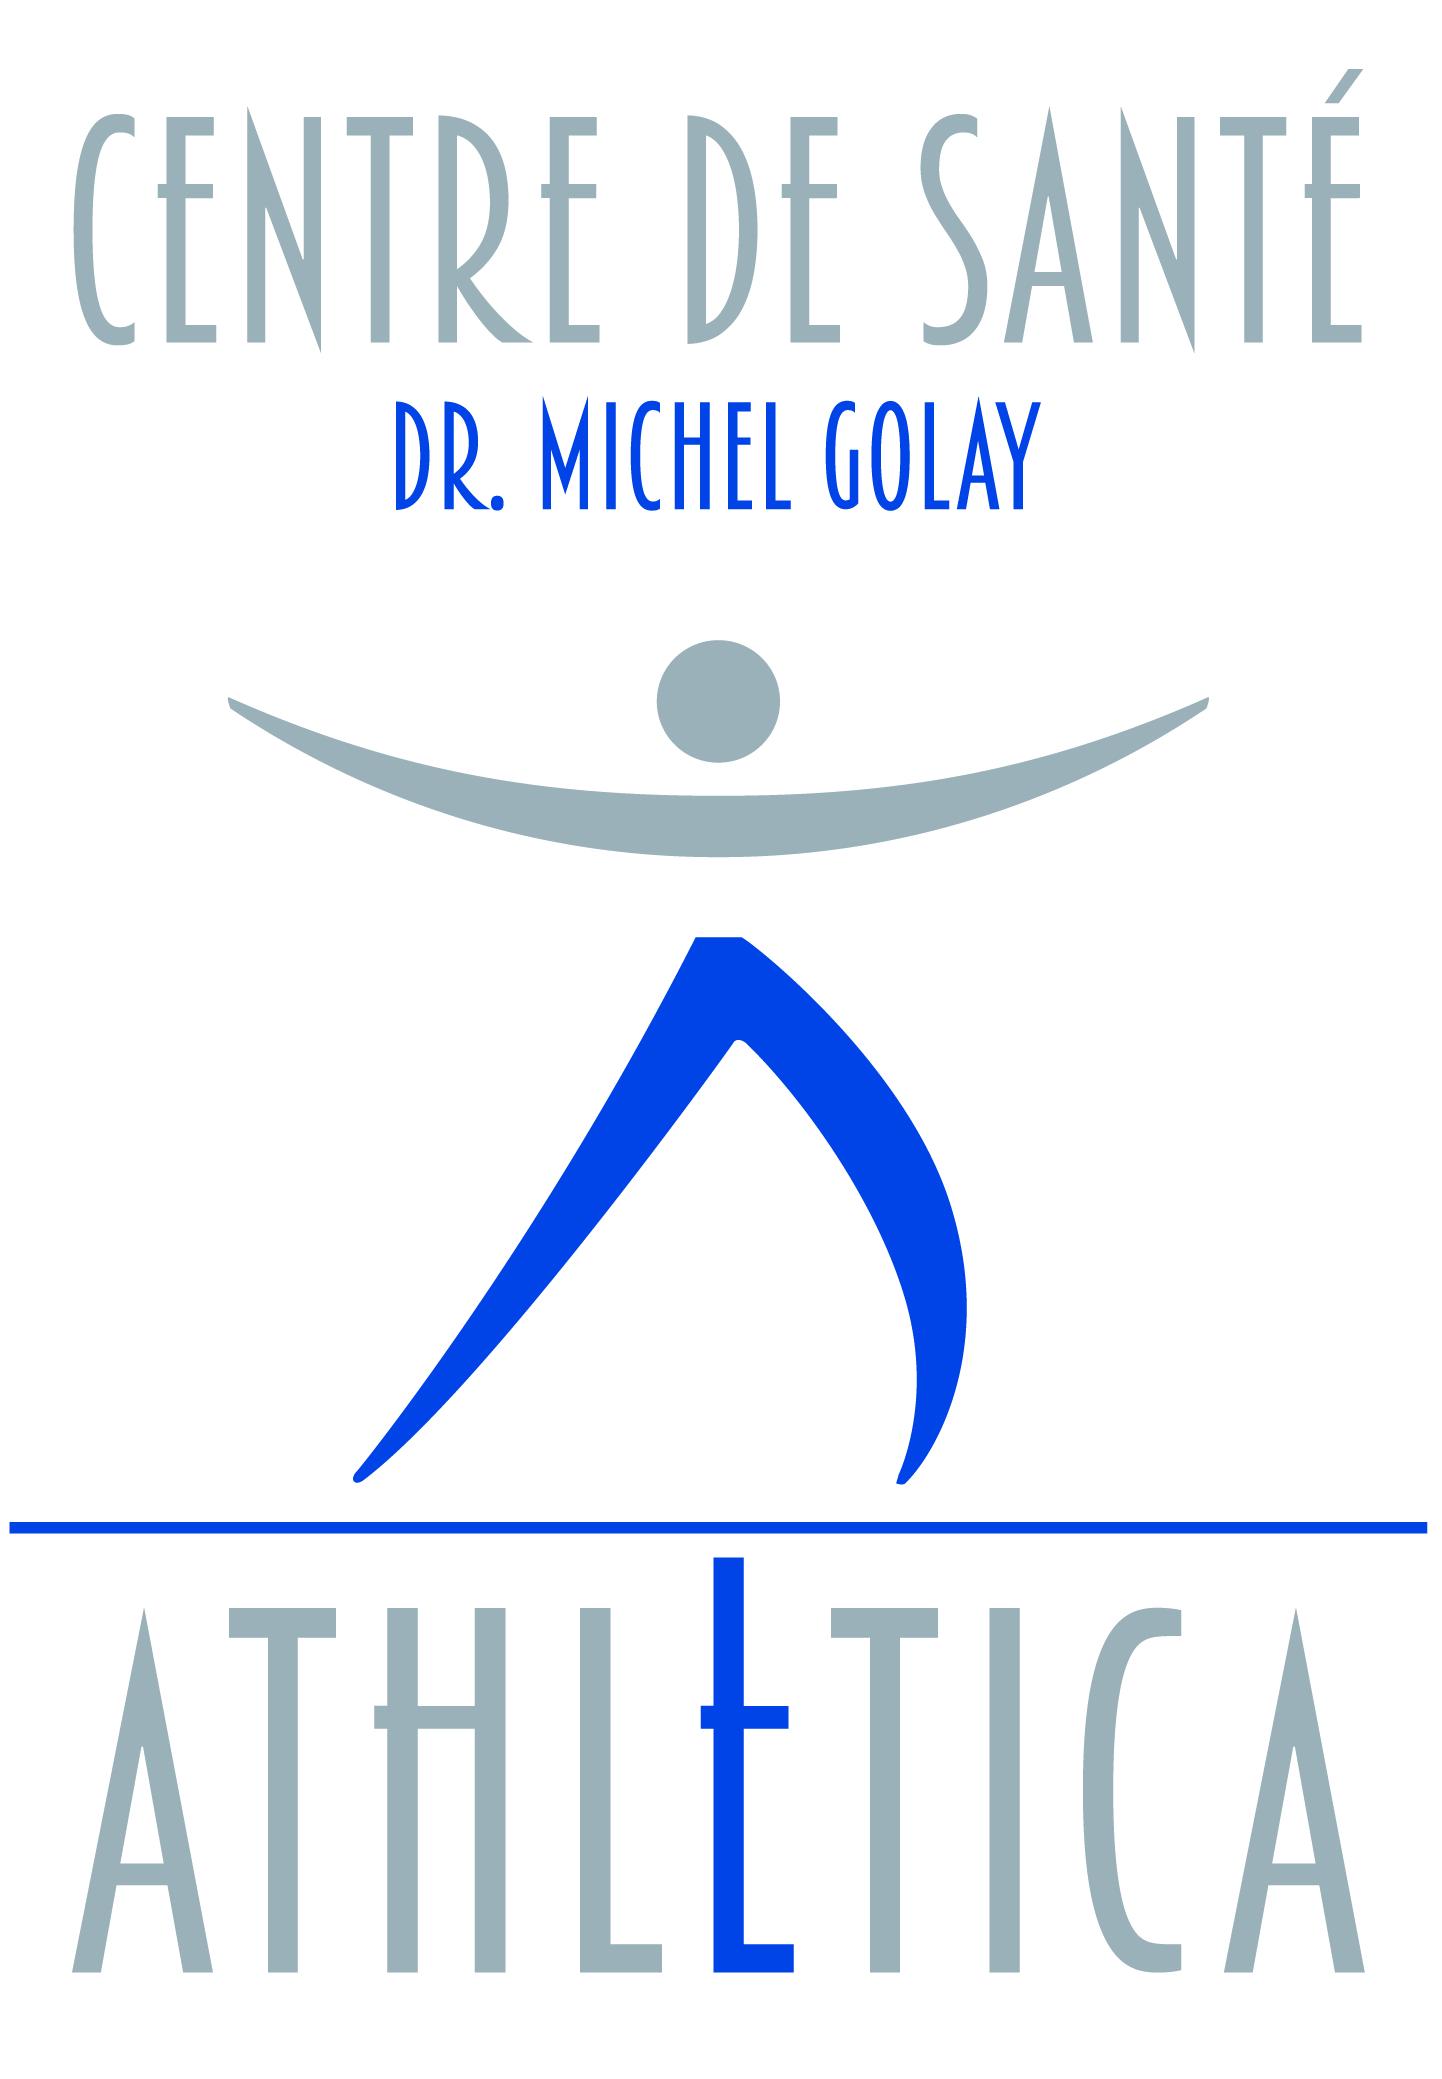 Athletica SA